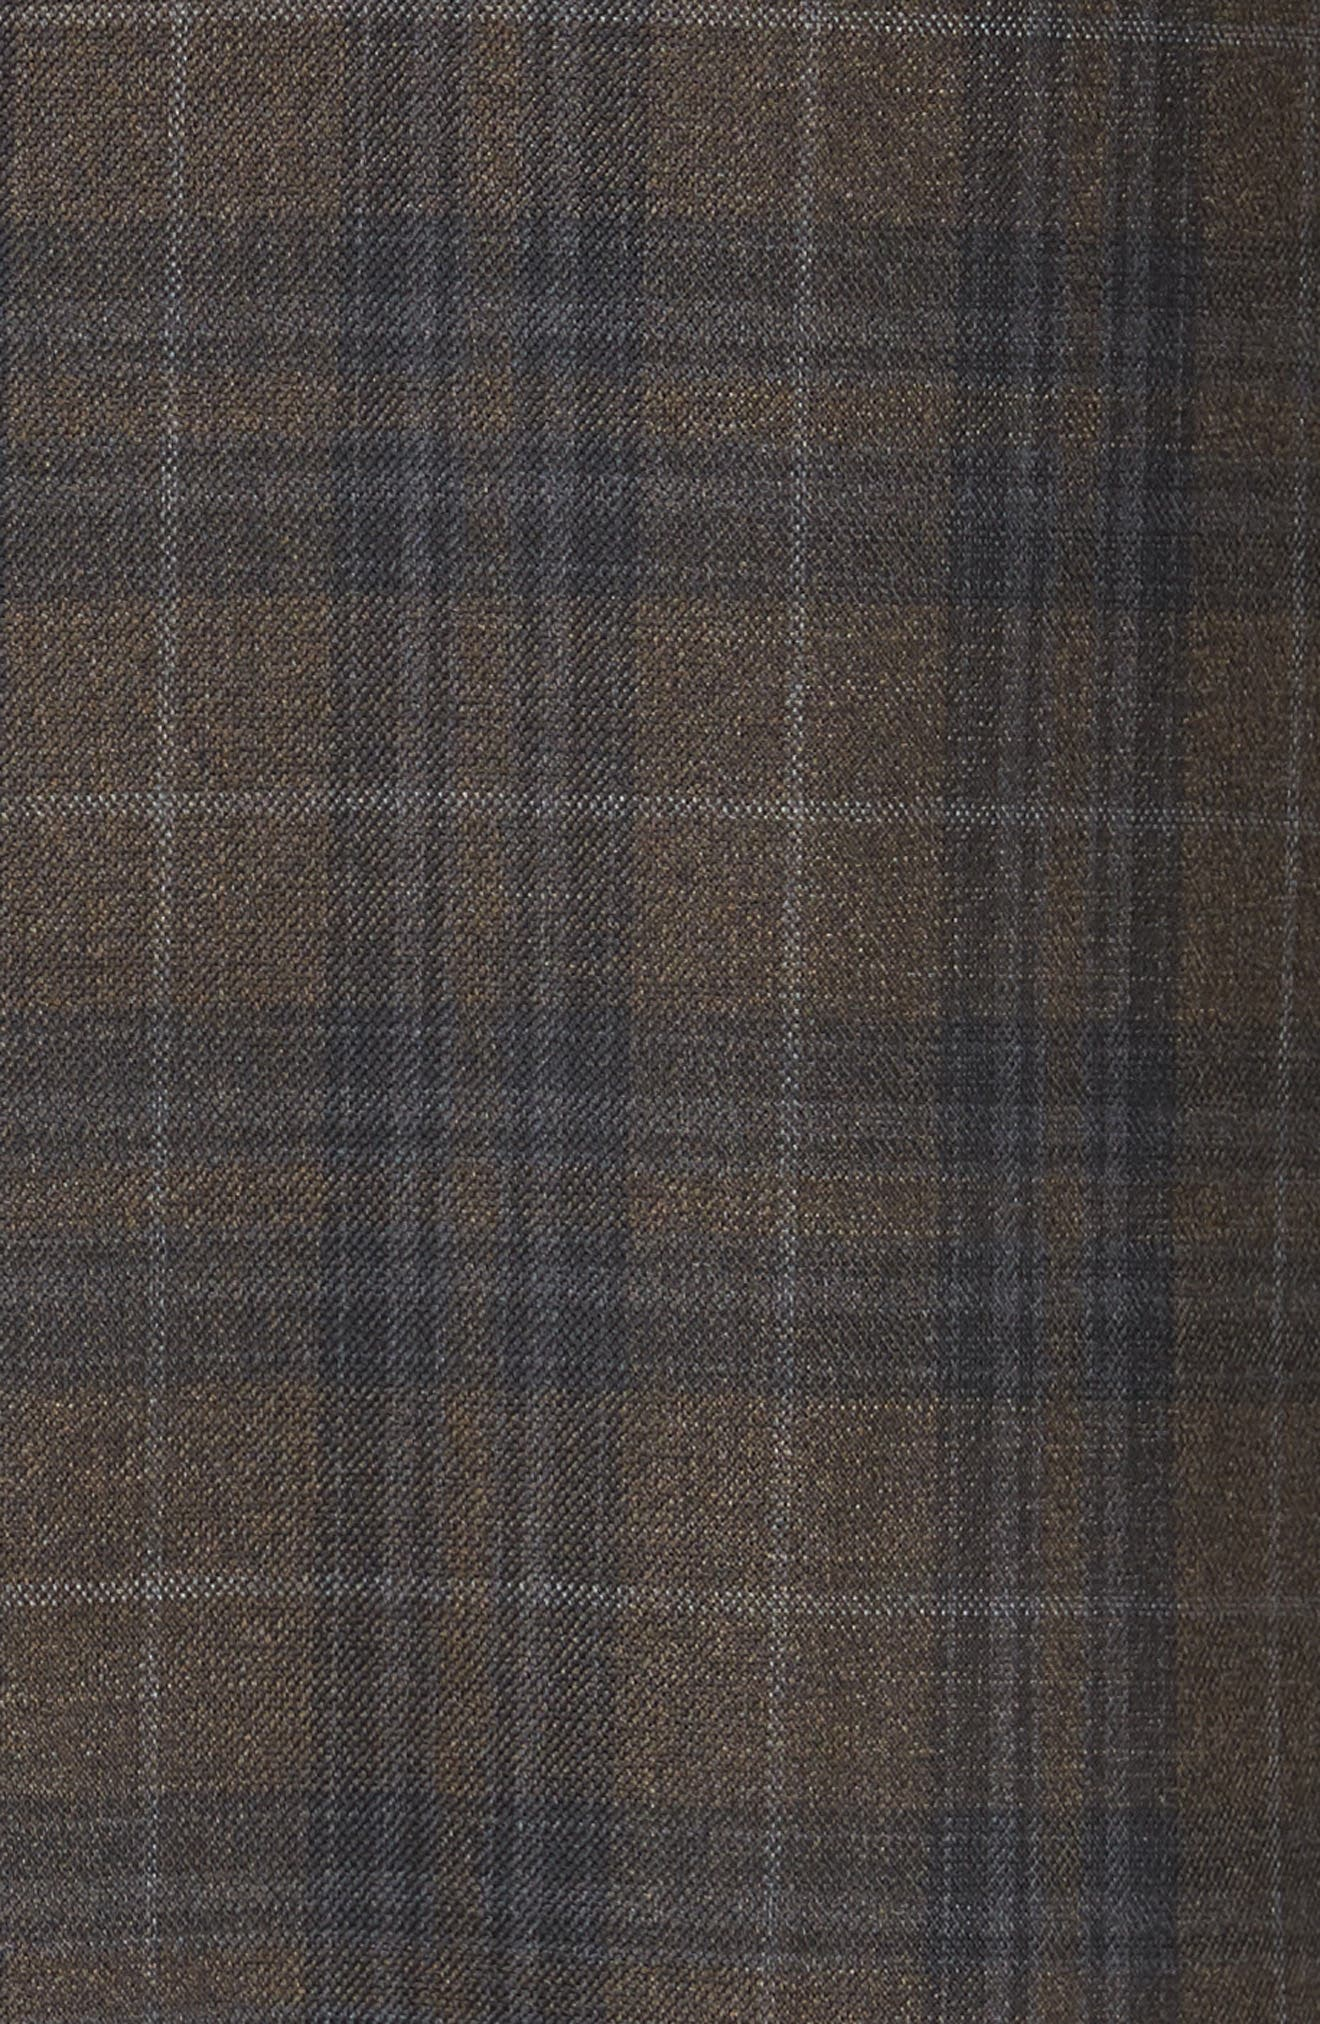 Classic Fit Plaid Wool Sport Coat,                             Alternate thumbnail 6, color,                             200